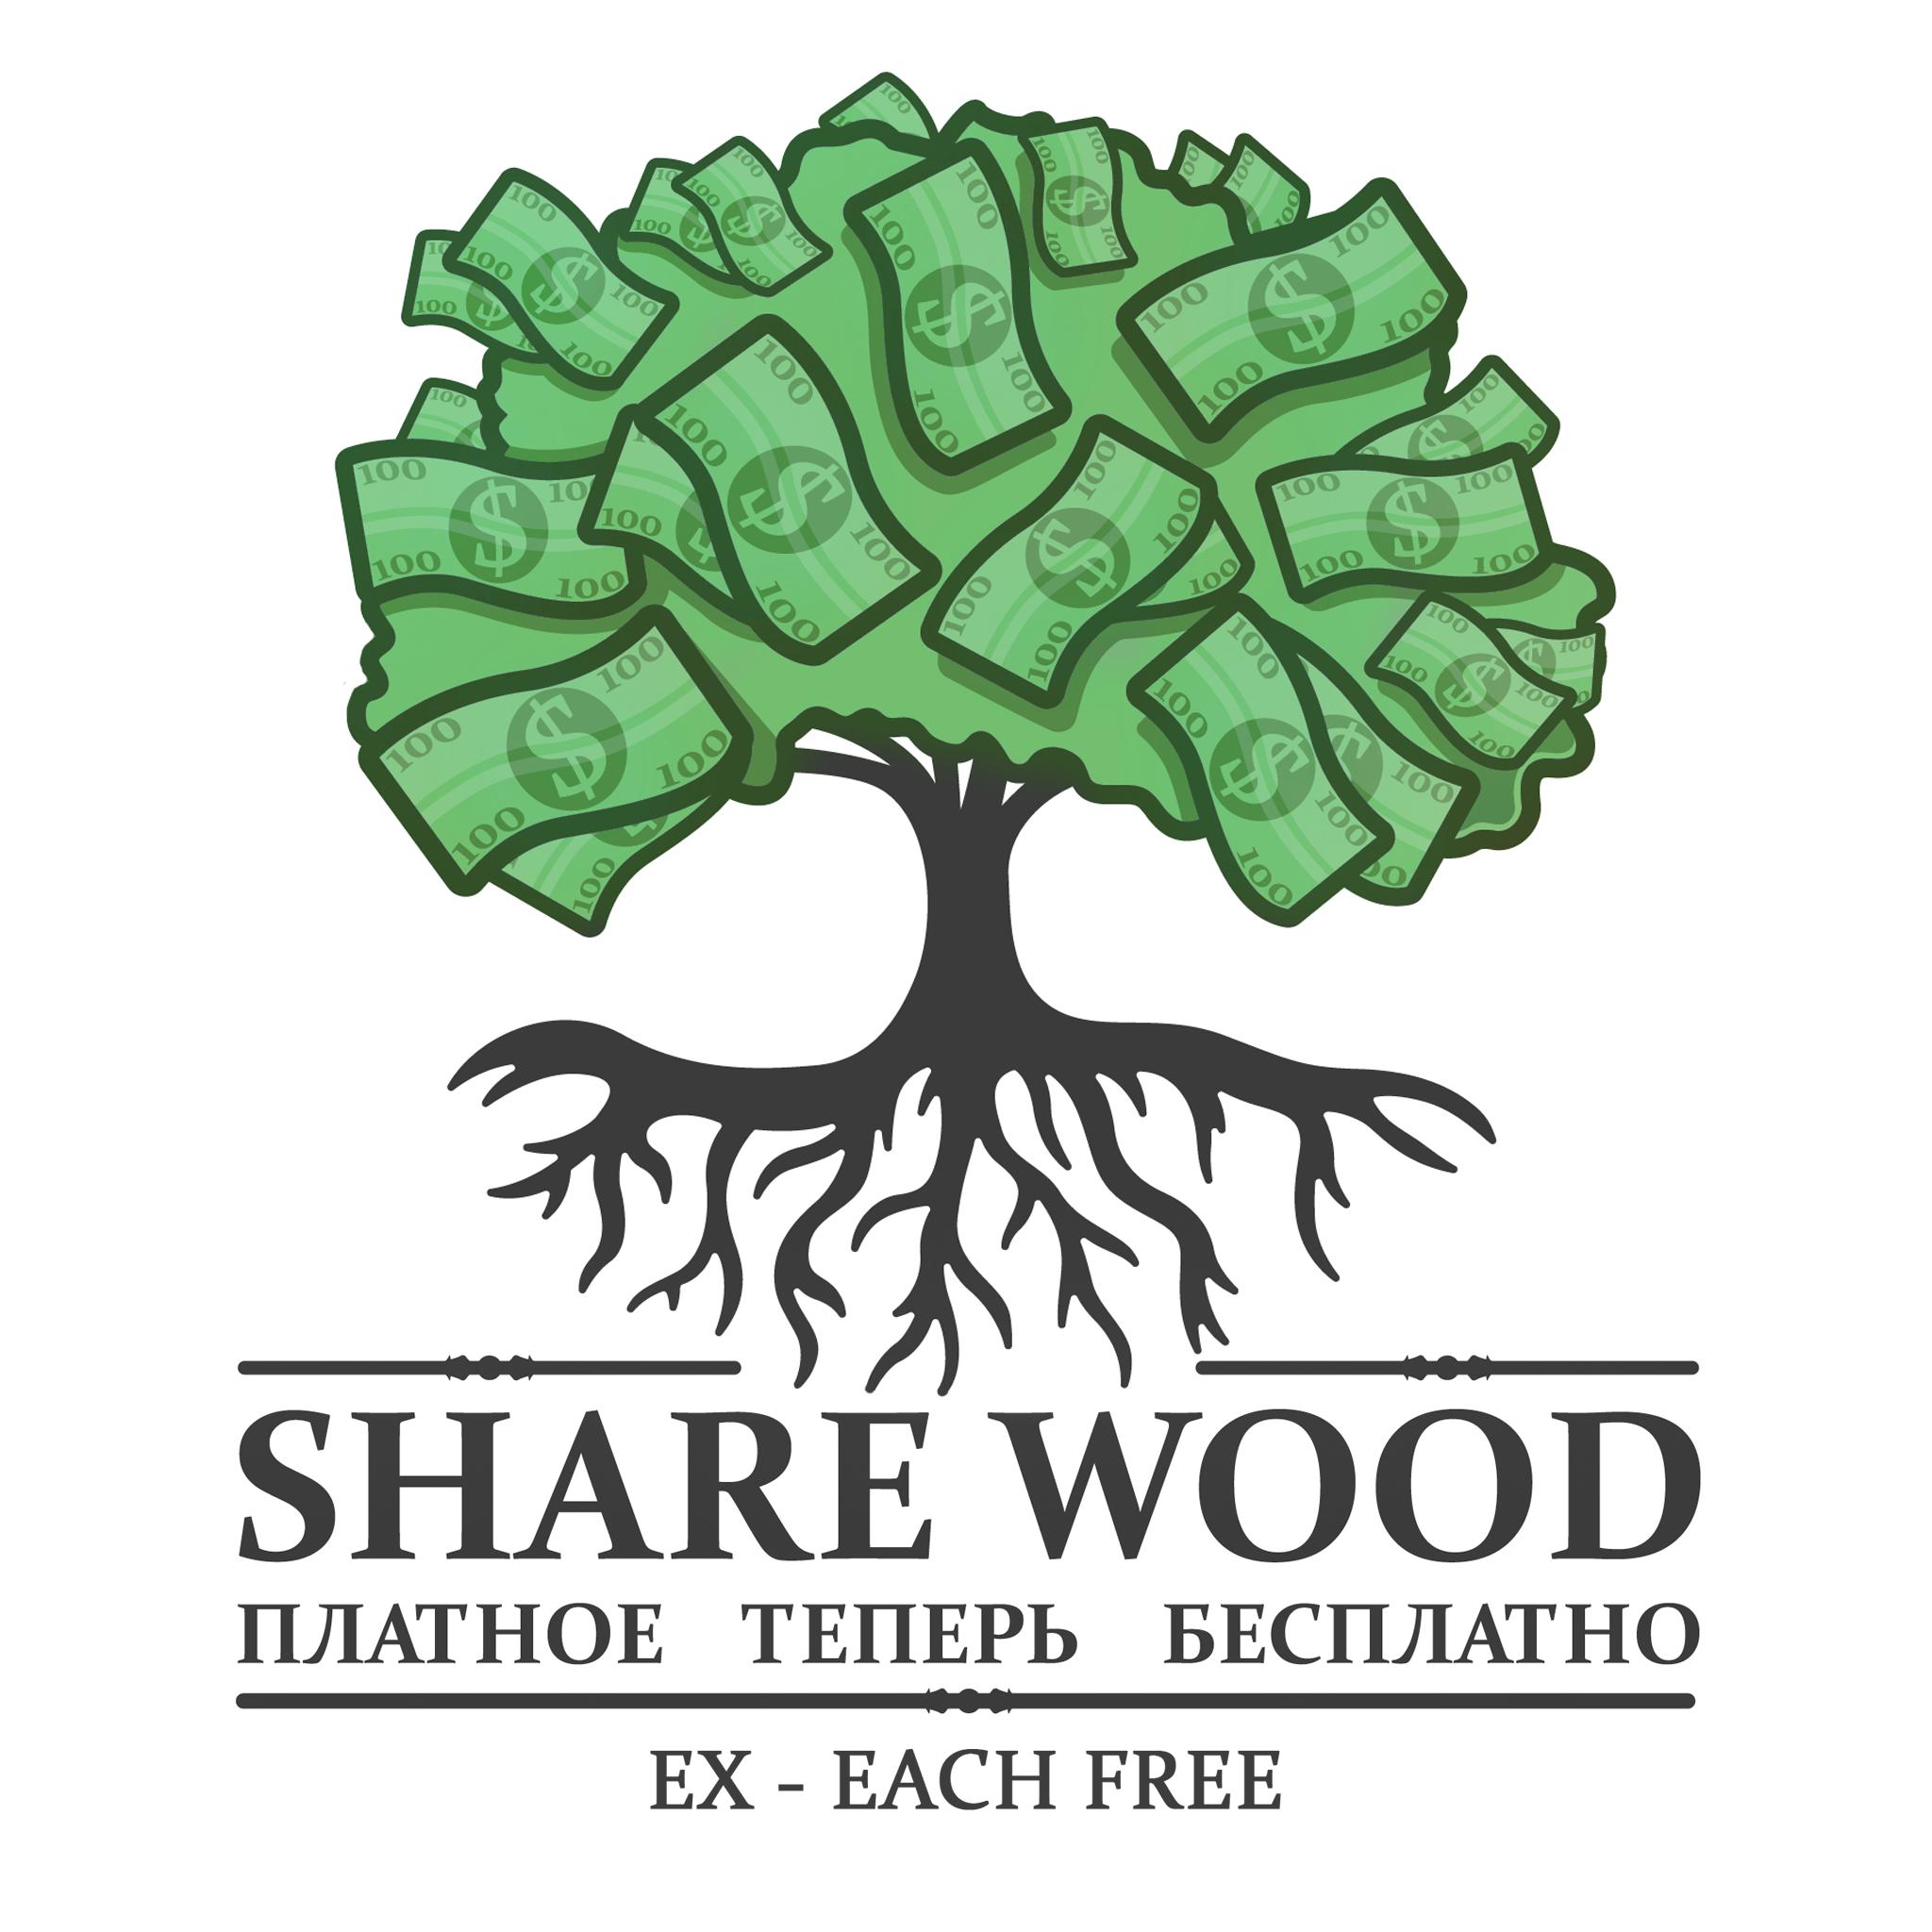 sharewood.pro